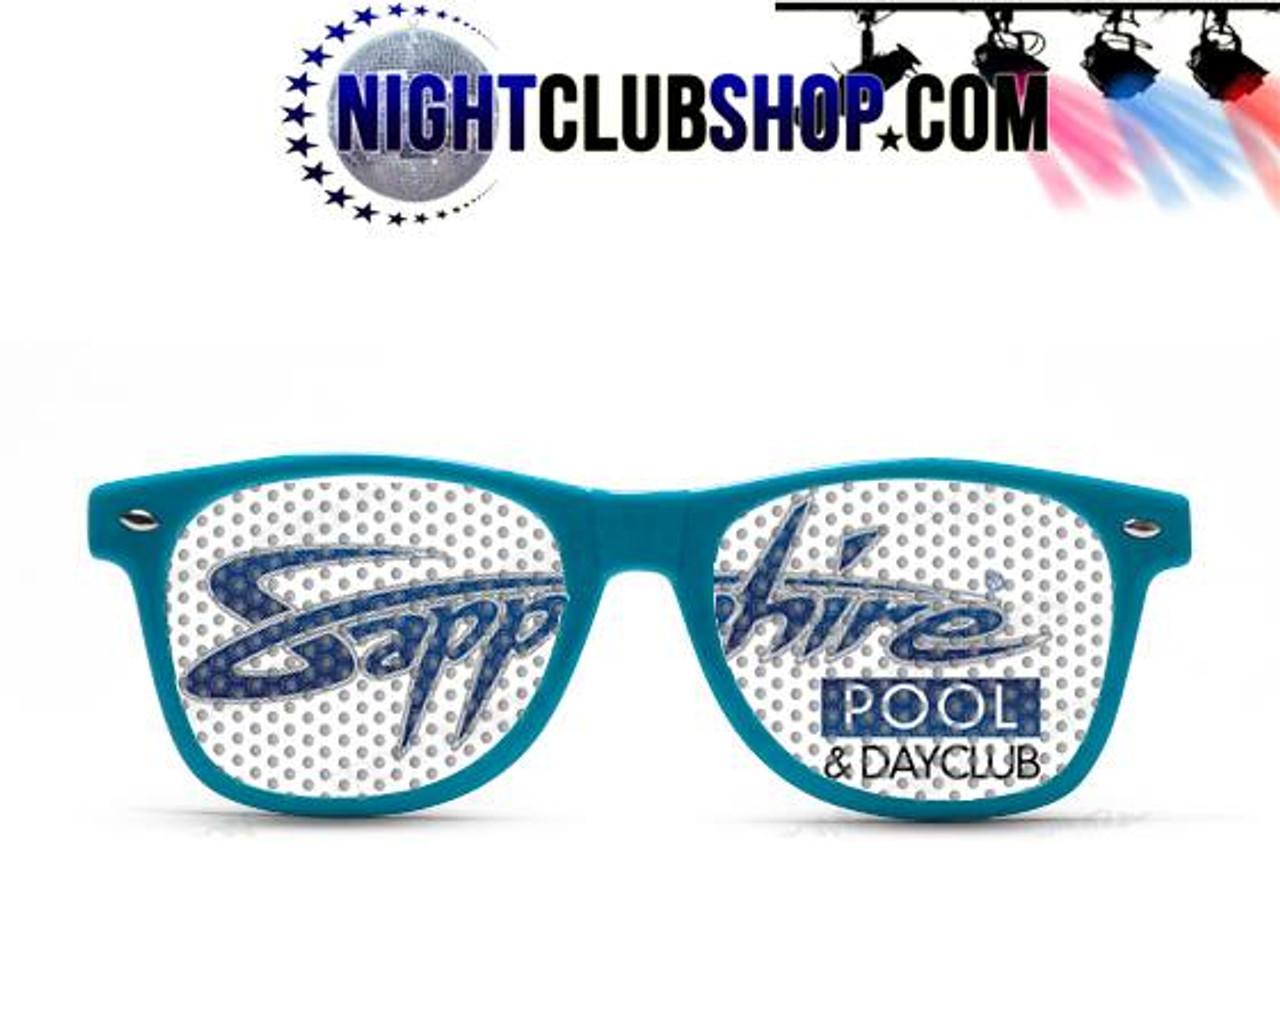 Custom_Print_I_Heart_Logo_Text_Billboard_DJ_Merch_sunglasses_Shades_lenses_Promotional